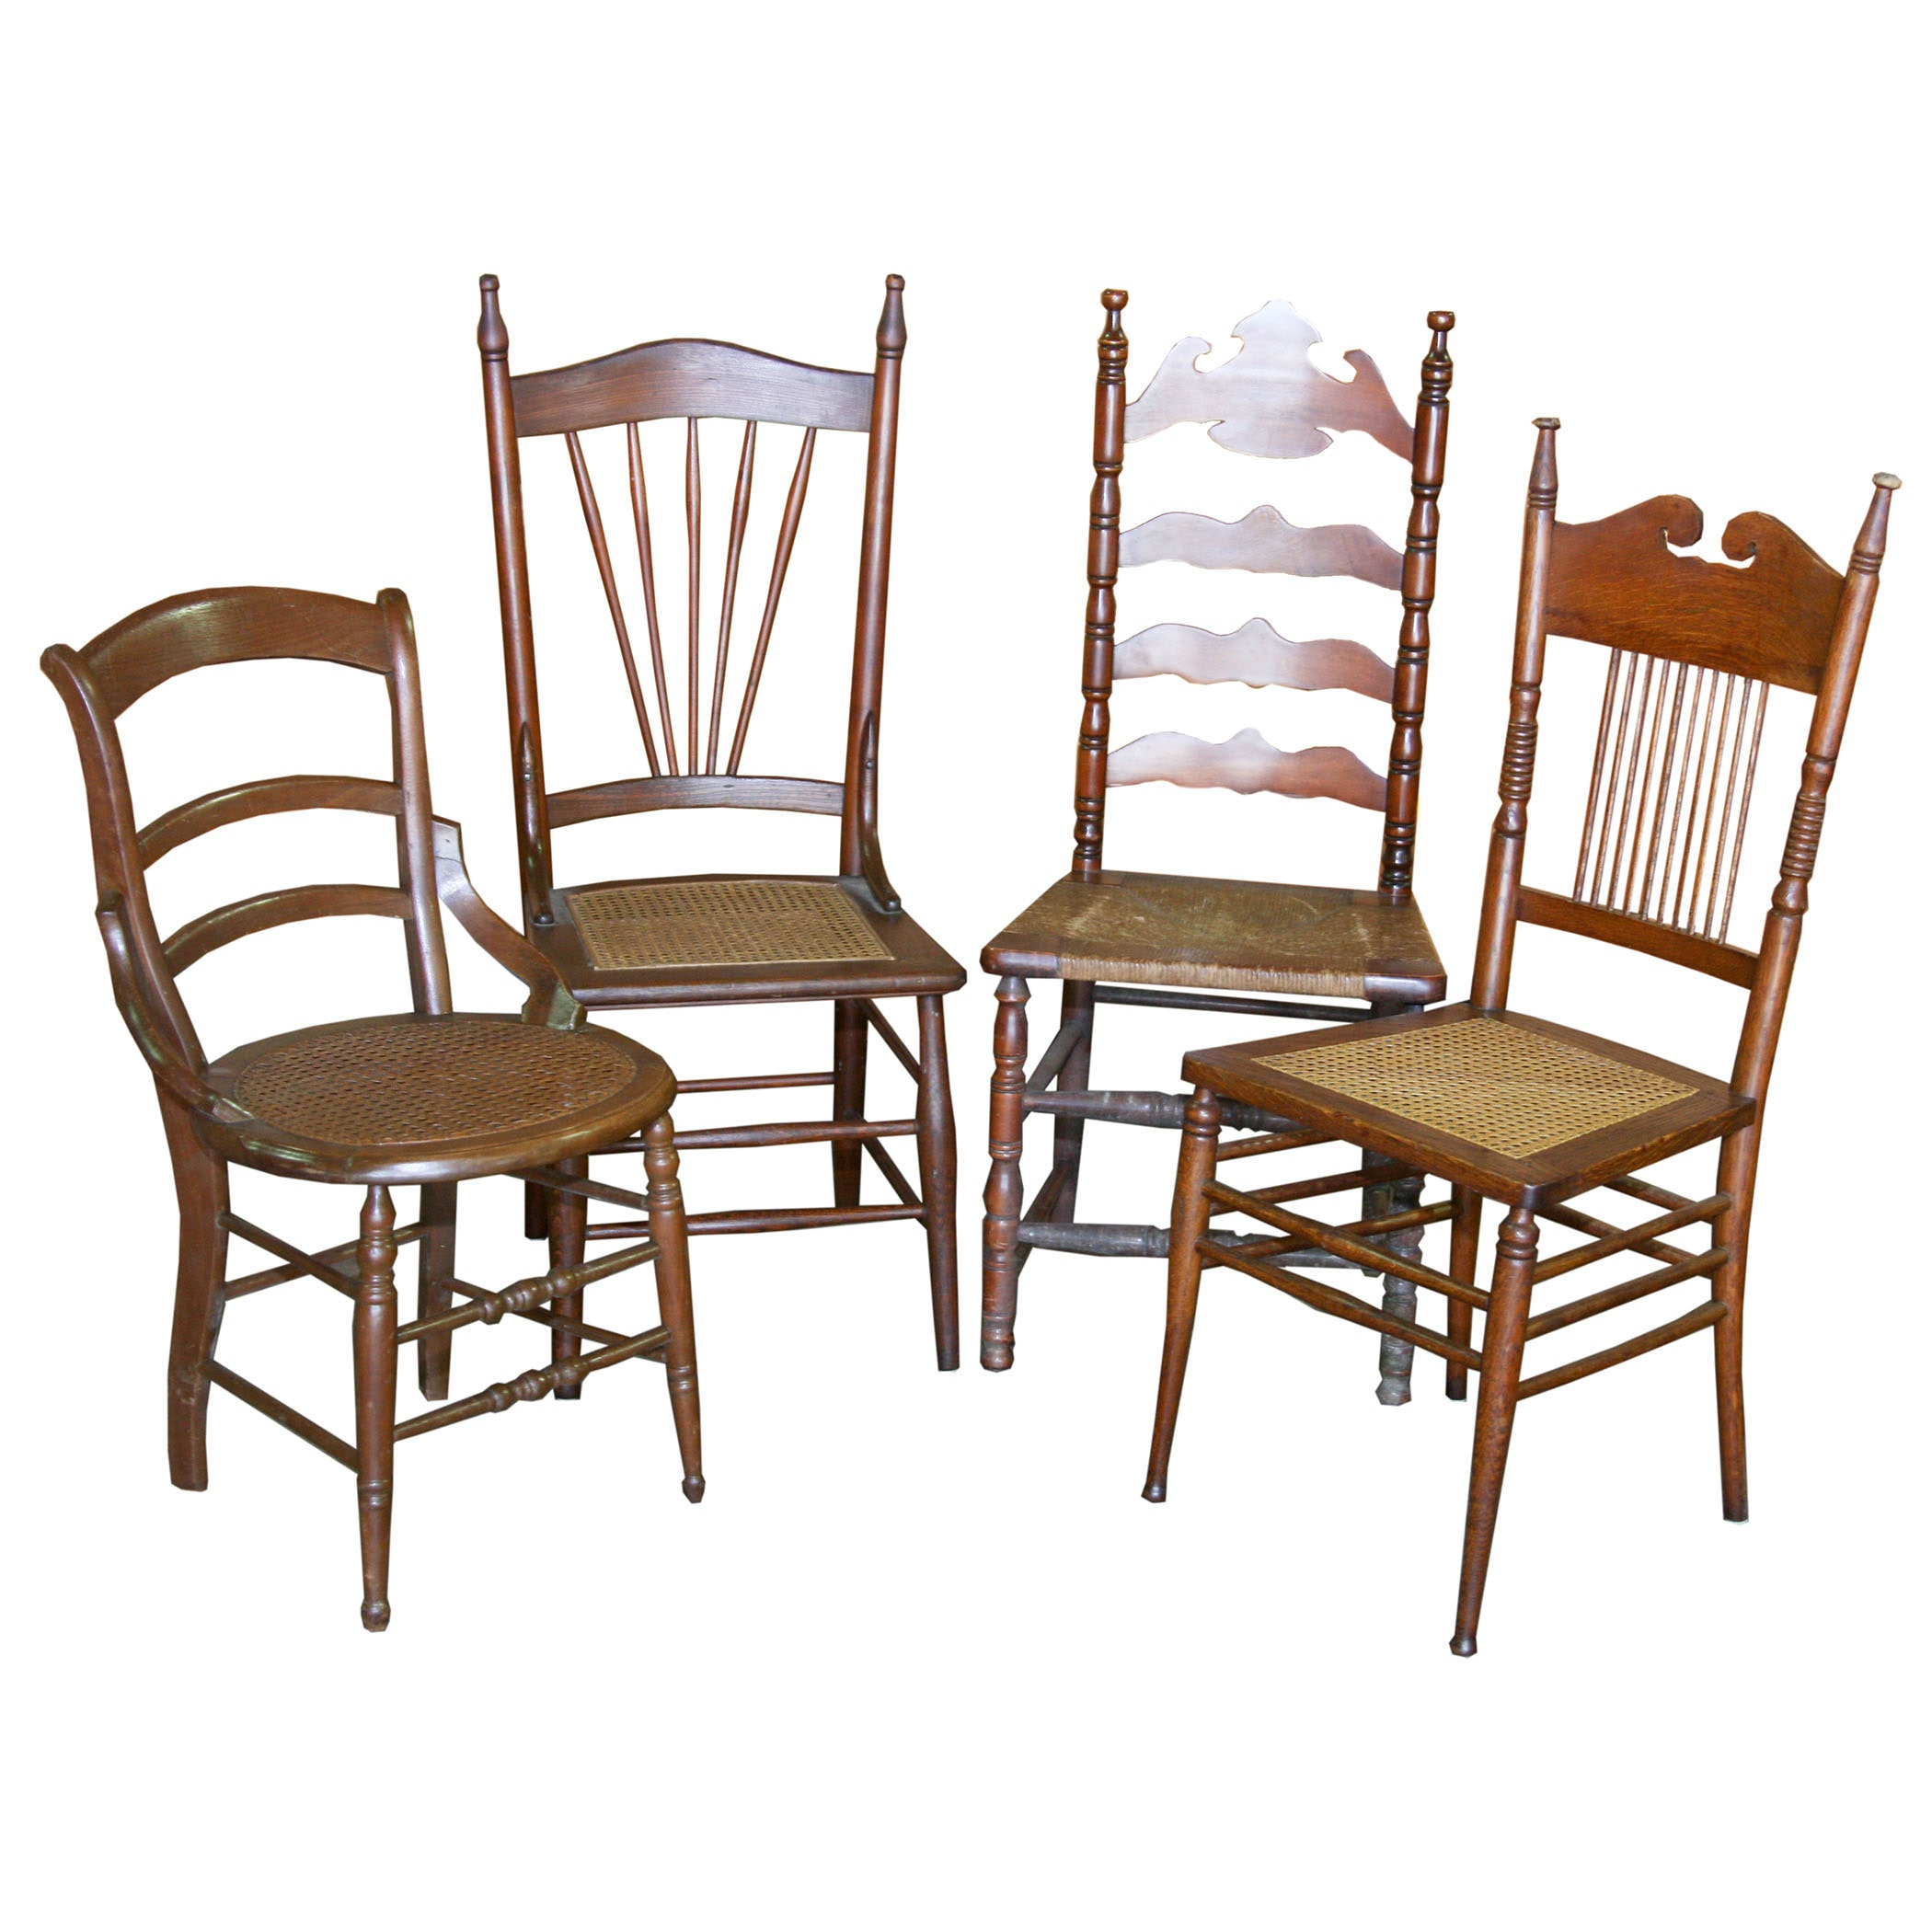 Four Farmhouse Dining Chairs